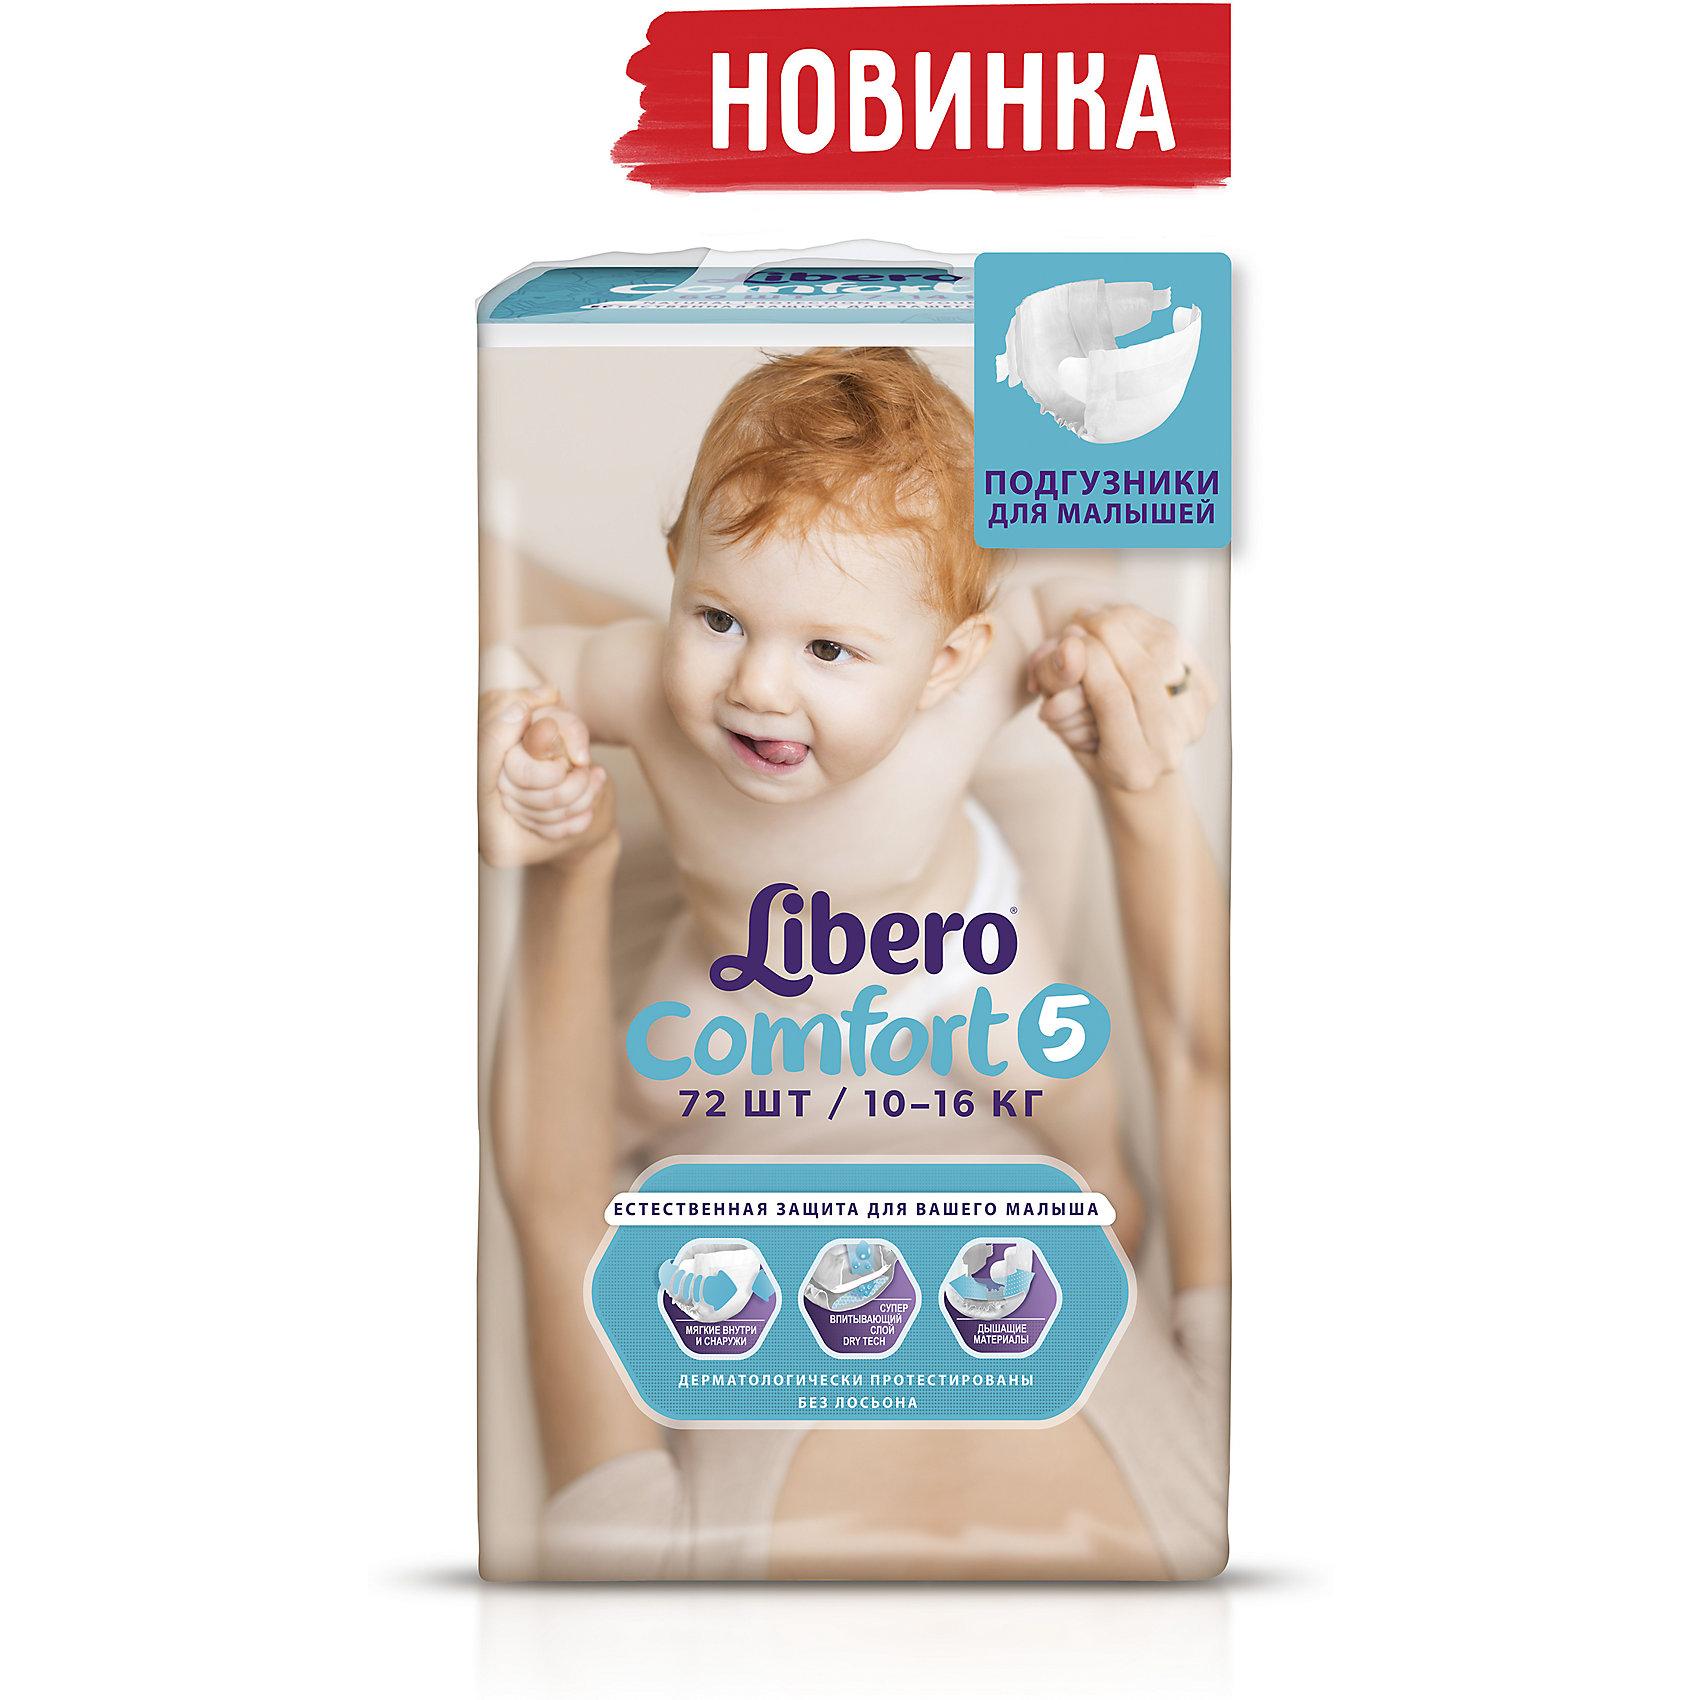 Libero Подгузники Comfort, Mega Plus Maxi Plus 10-16 кг (5), 72 шт., Libero подгузники libero comfort maxi 10 16 кг 18 шт размер 5